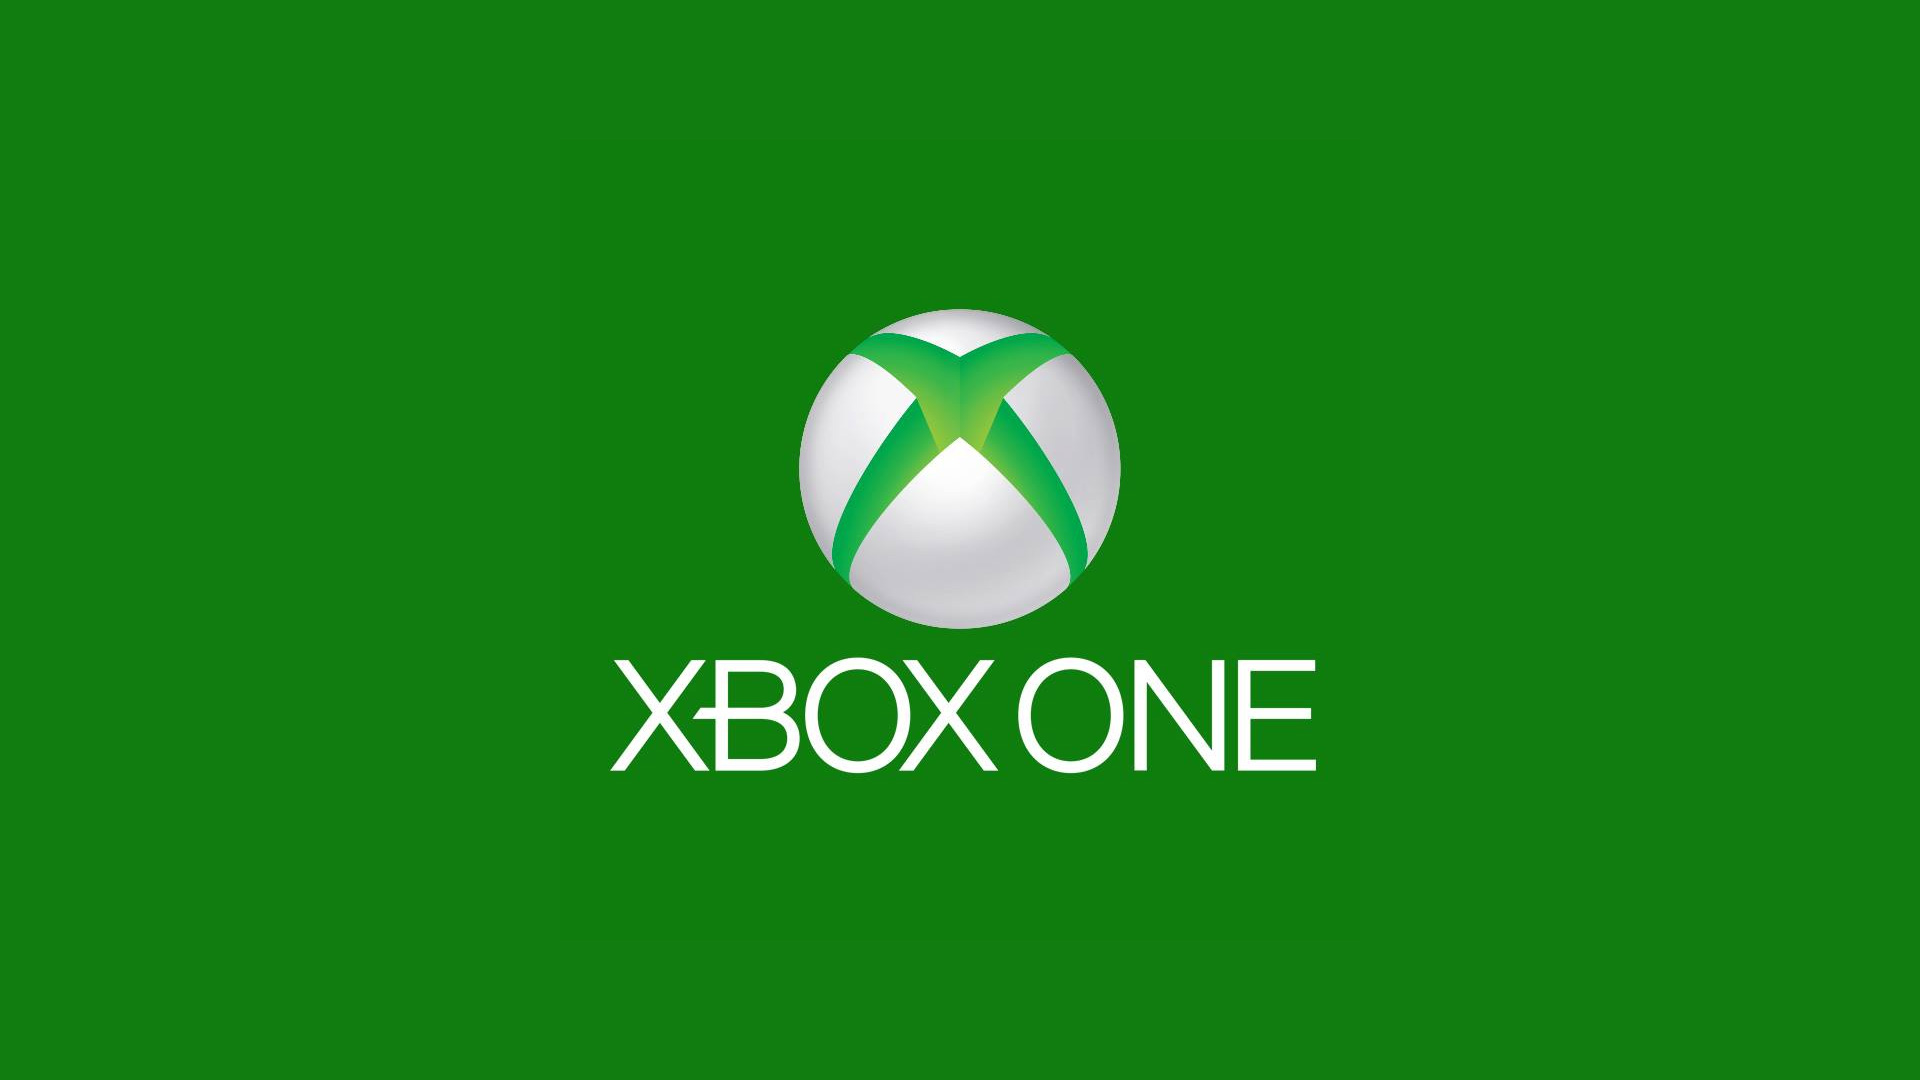 Xbox 360 Logo Png White Starting next week  the Xbox